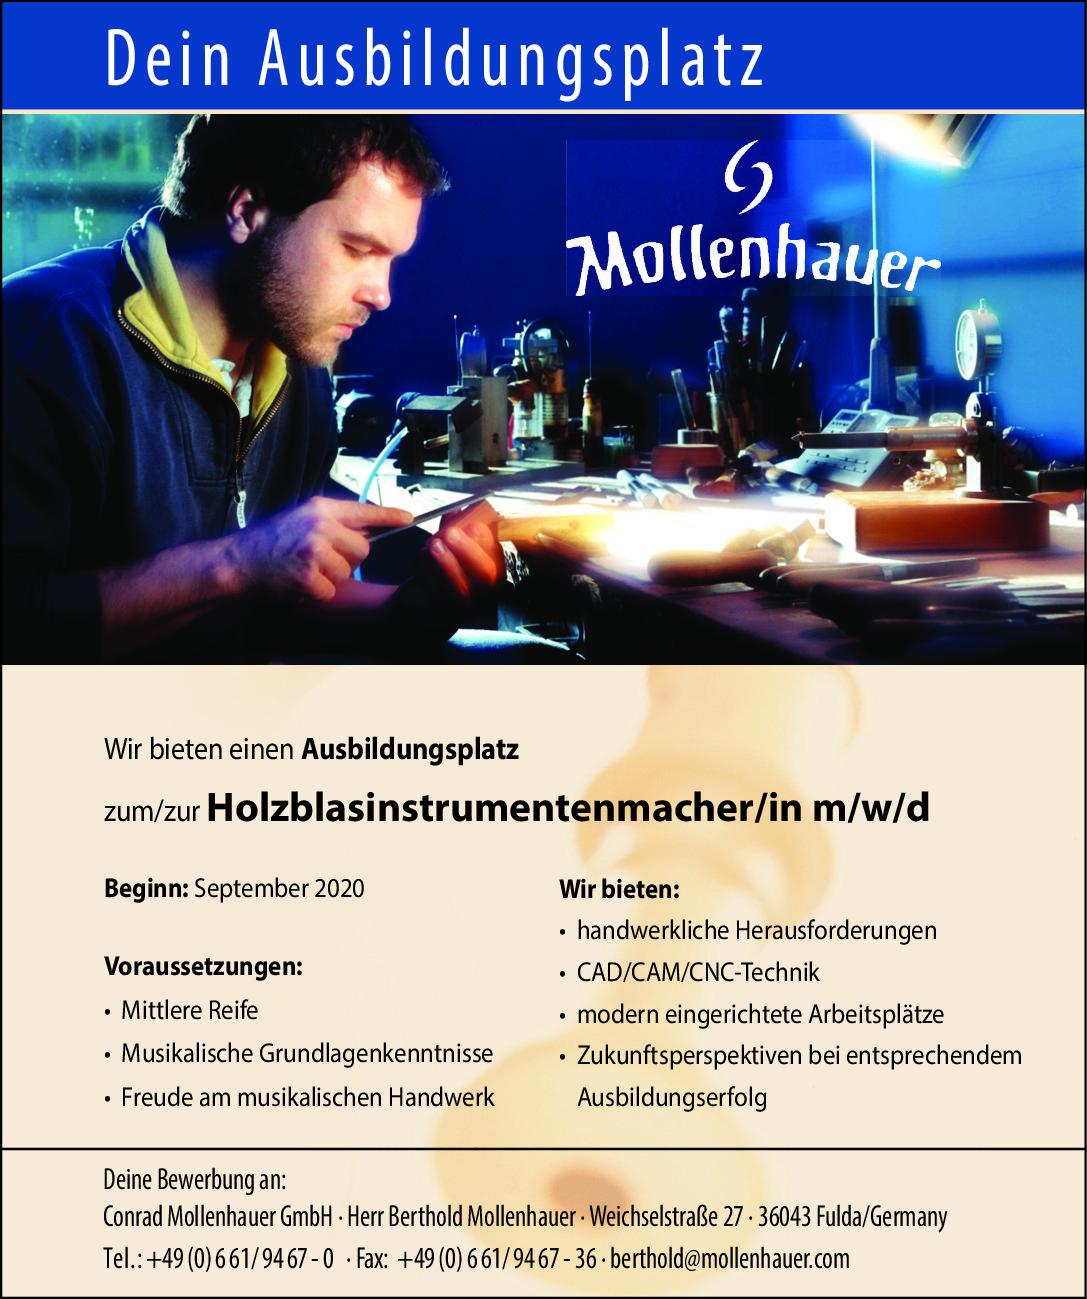 Azubi Holzblasinstrument (m/w/d)